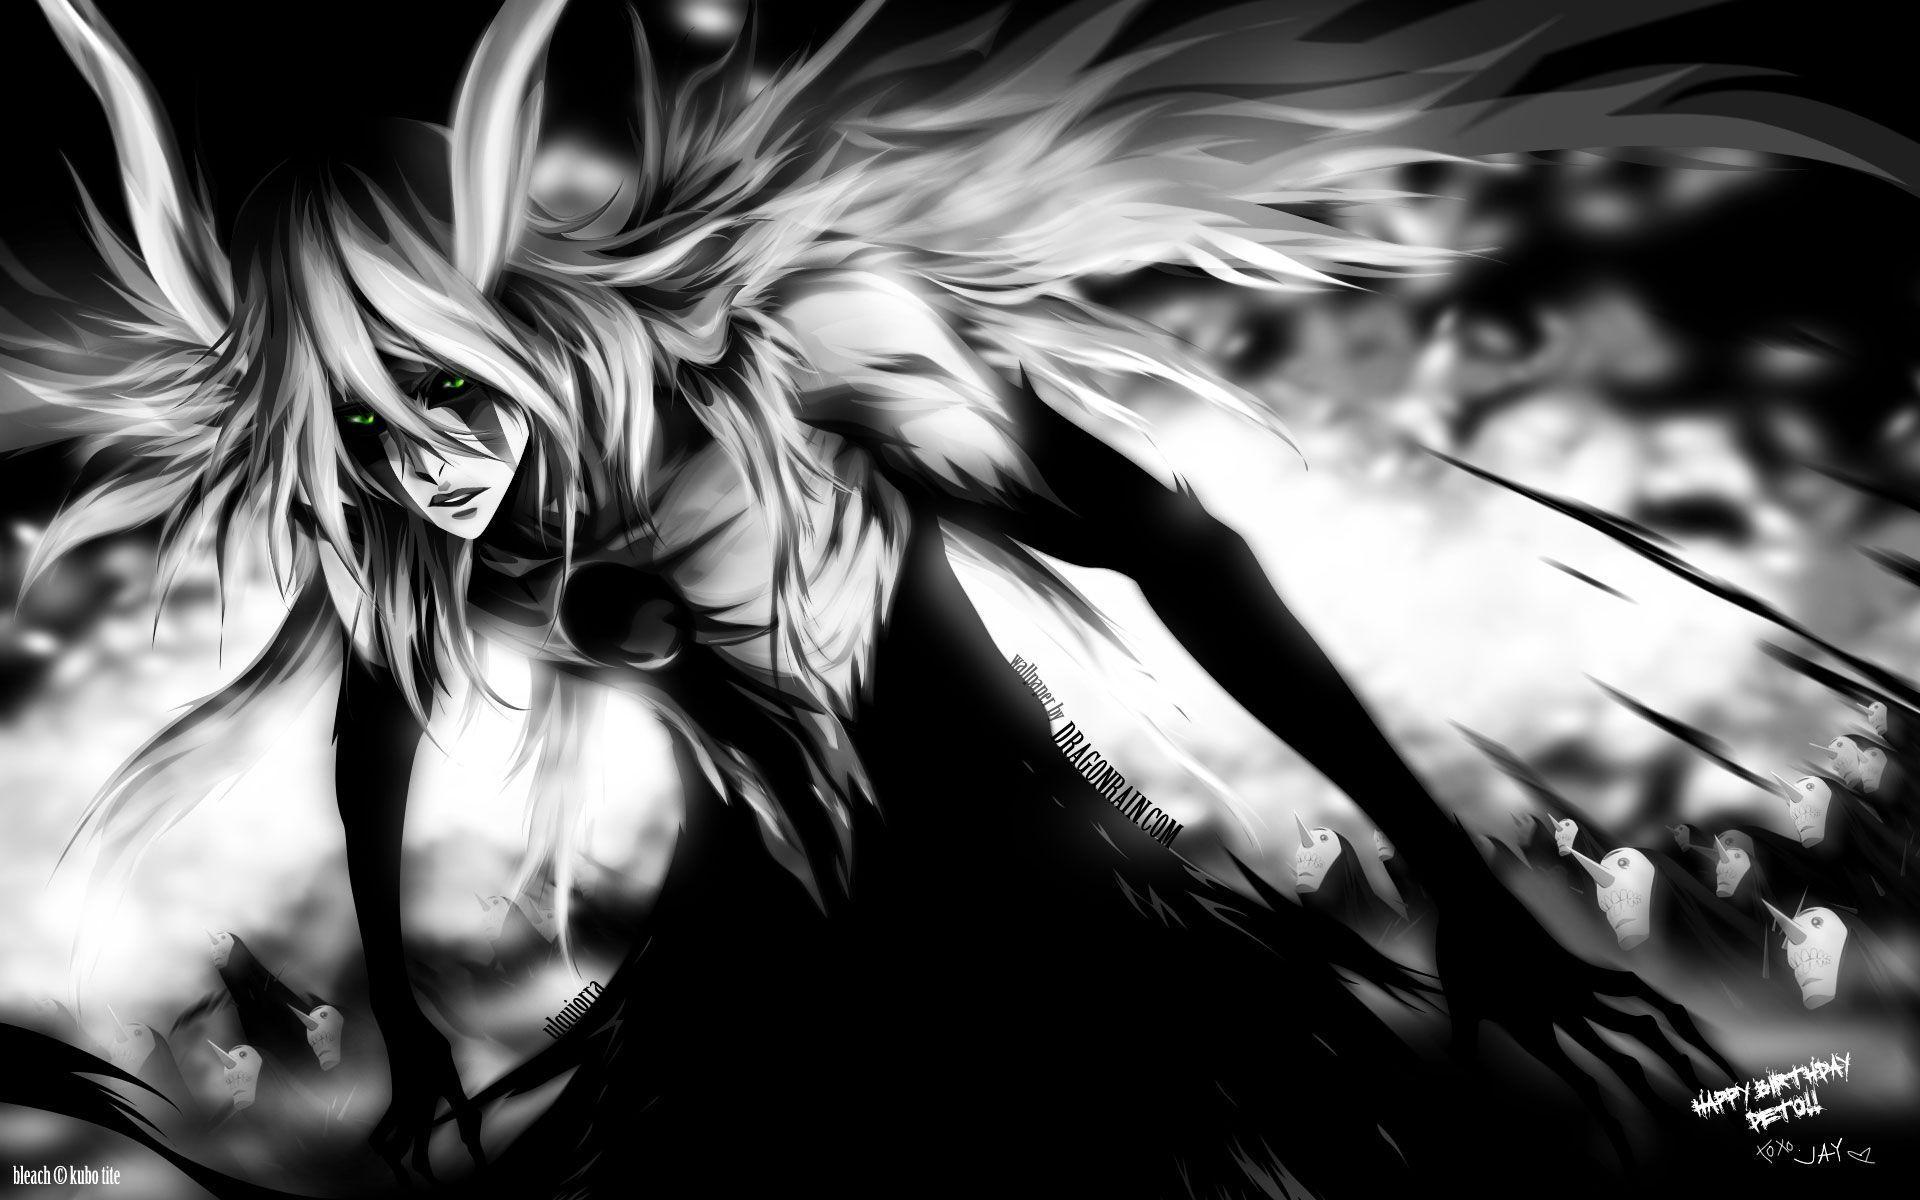 Ulquiorra Cifer Espada Bleach 0346 Hd Wallpaper Anime Oscuro